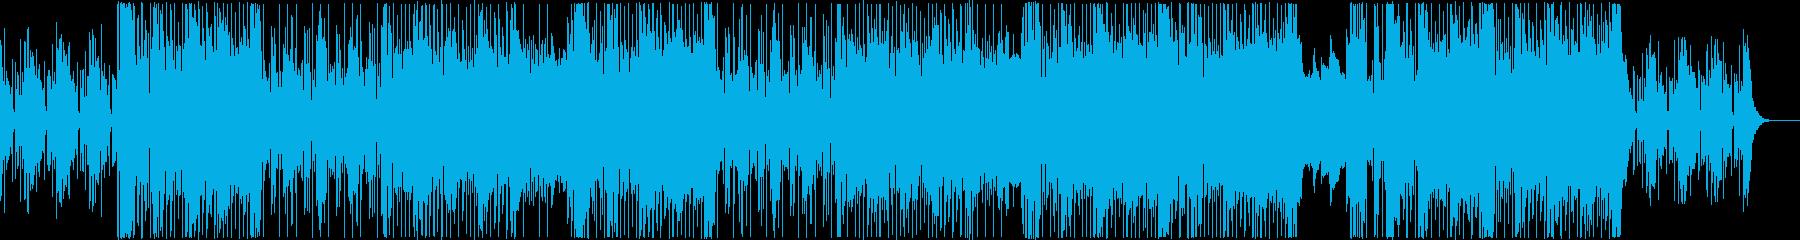 R&B/ゴスペル調BGMの再生済みの波形